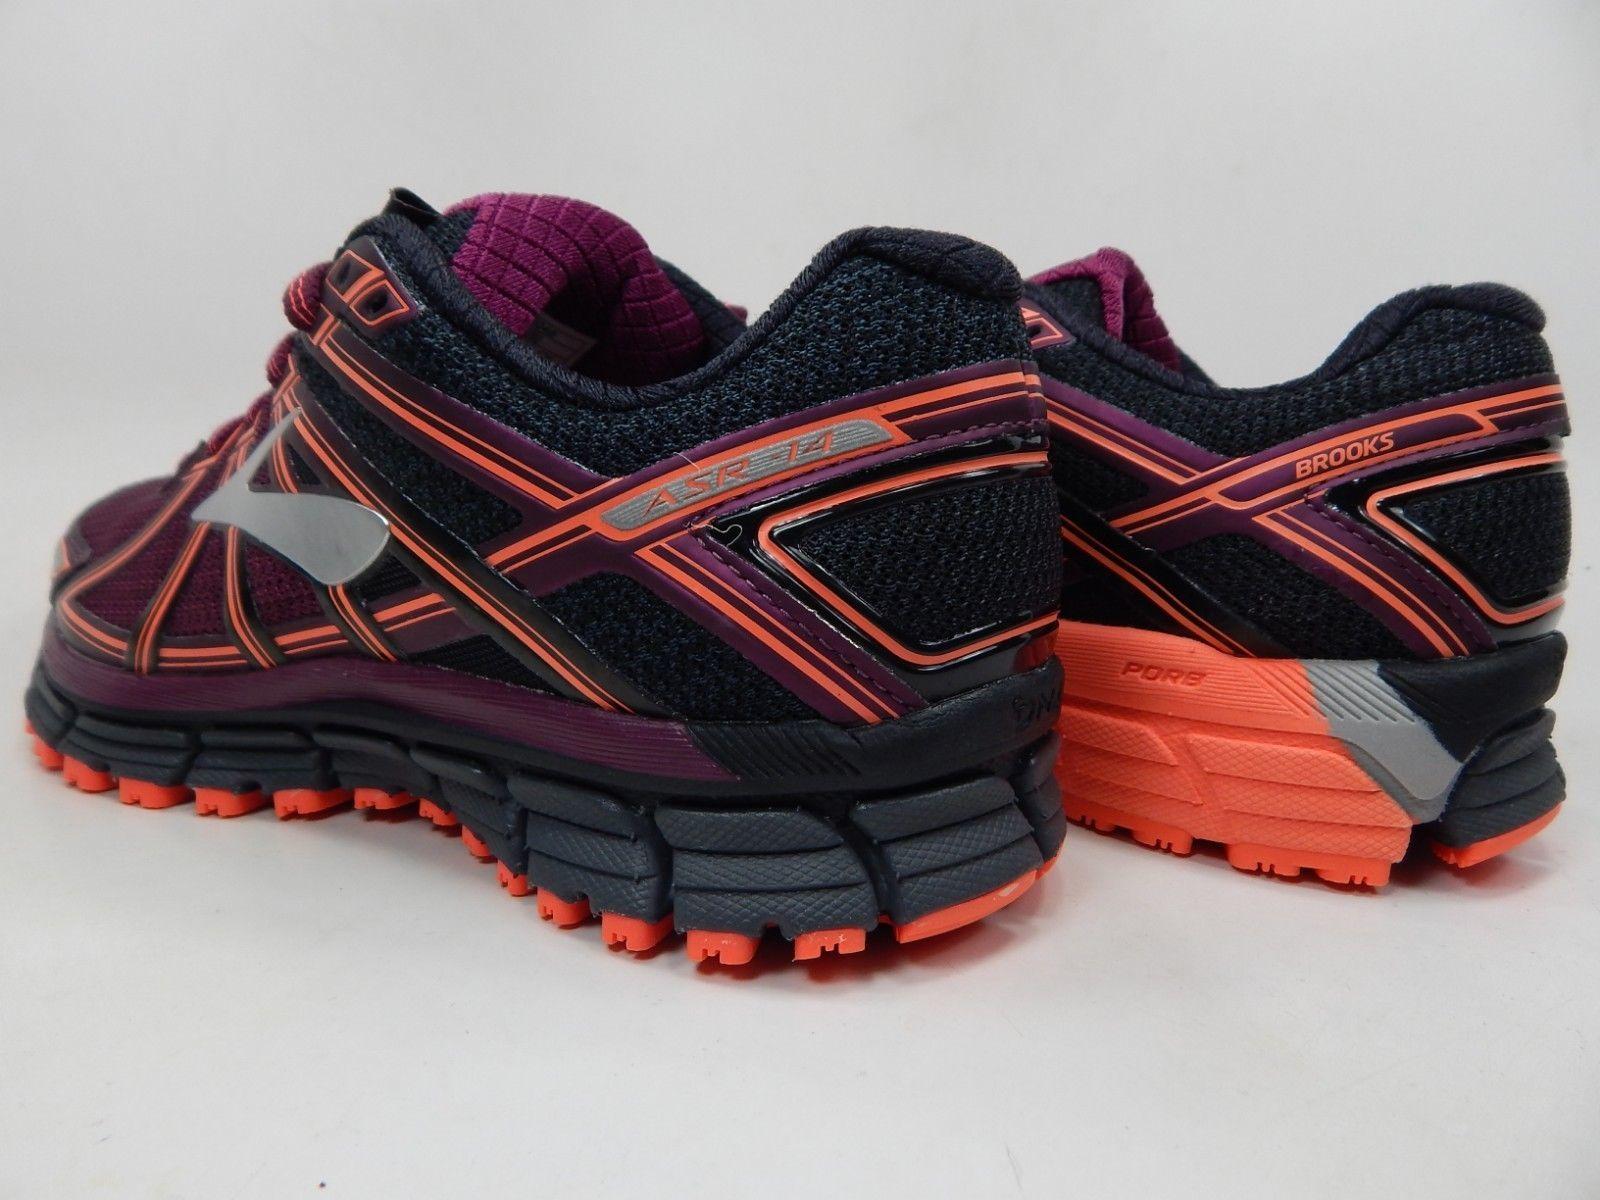 27f523eb76a Brooks Adrenaline ASR 14 Sz 7 M (B) EU 38 Womens Trail Running Shoes